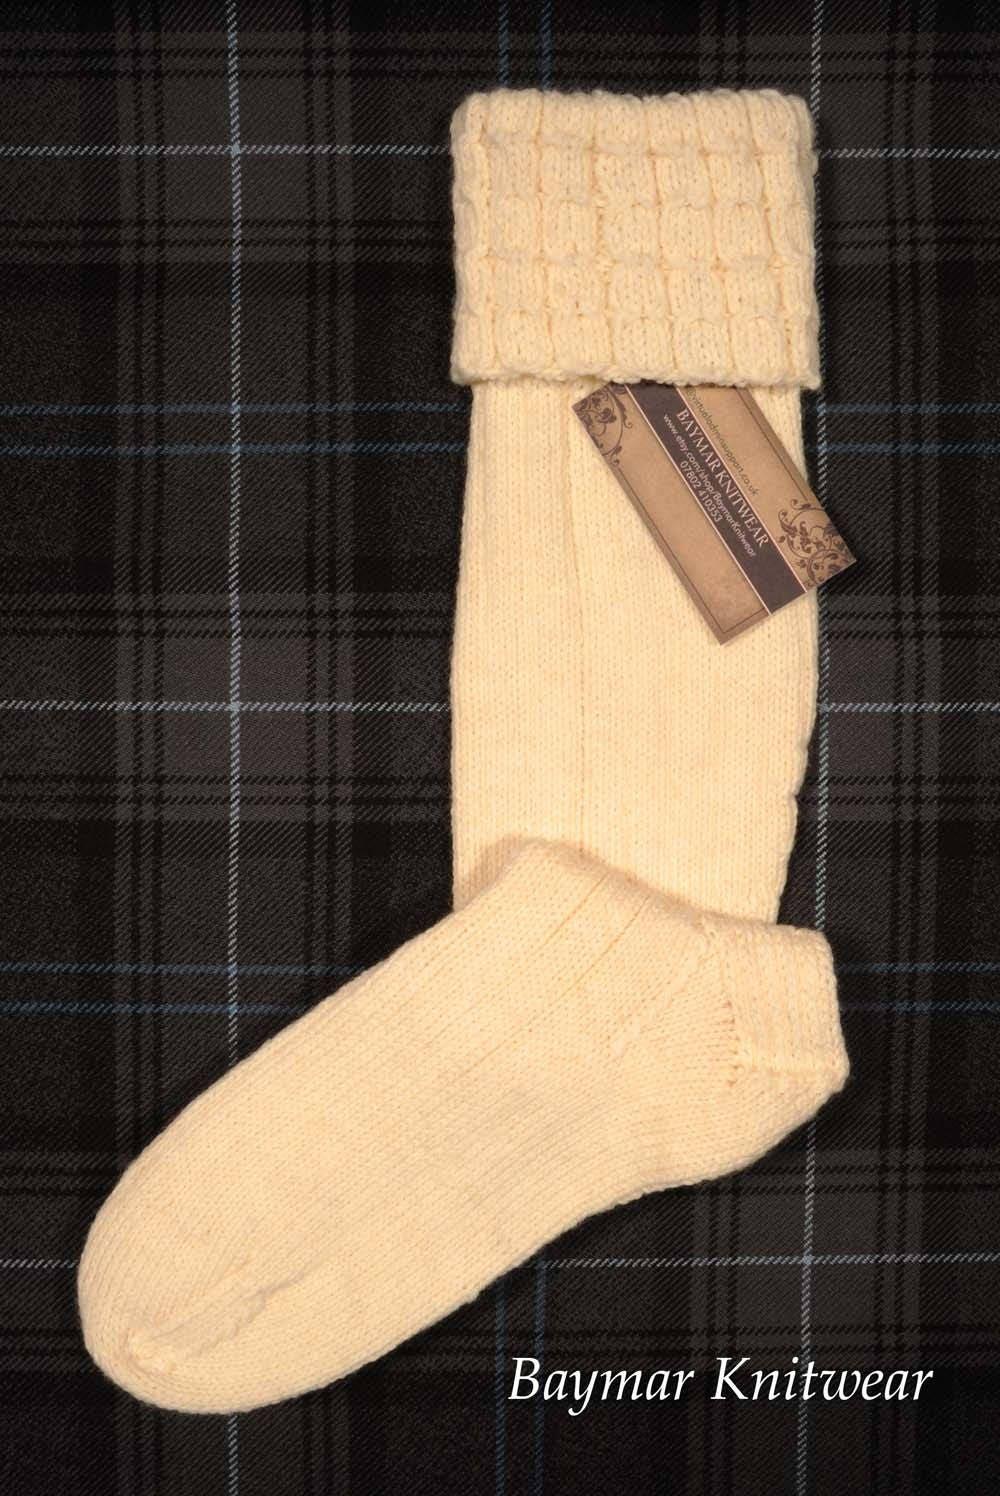 Hand Knitted Kilt Hose  Socks  Made in Scotland  Baymar Knitwear